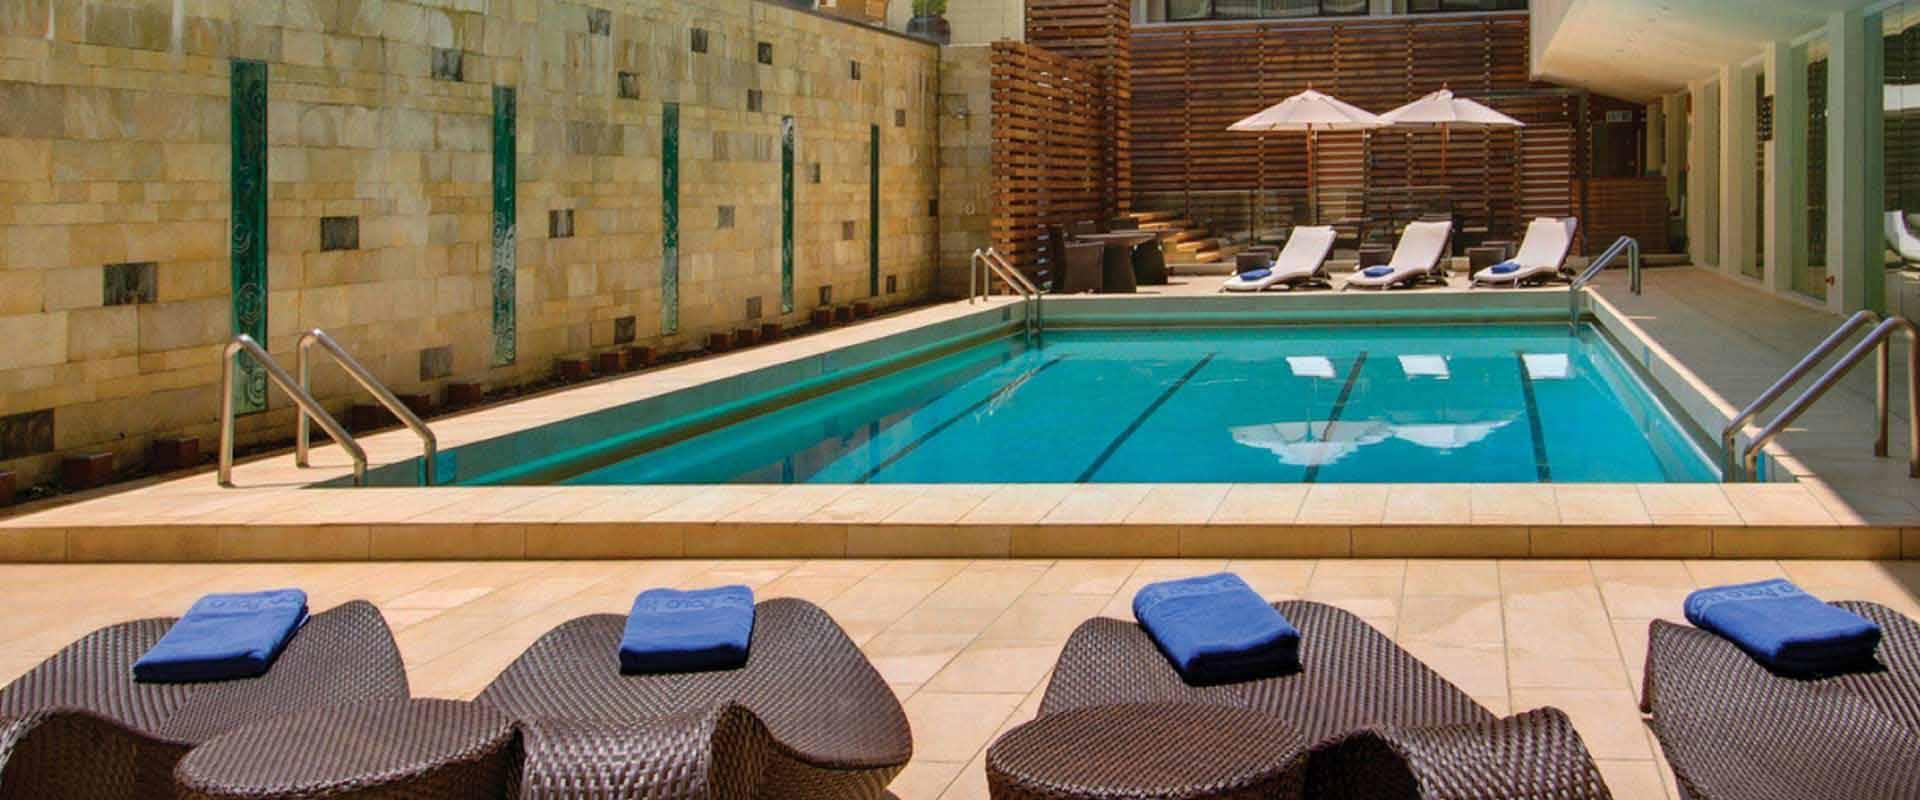 Dubai Hotels Marco Polo Hotel Greece Mediterranean Travel Centre